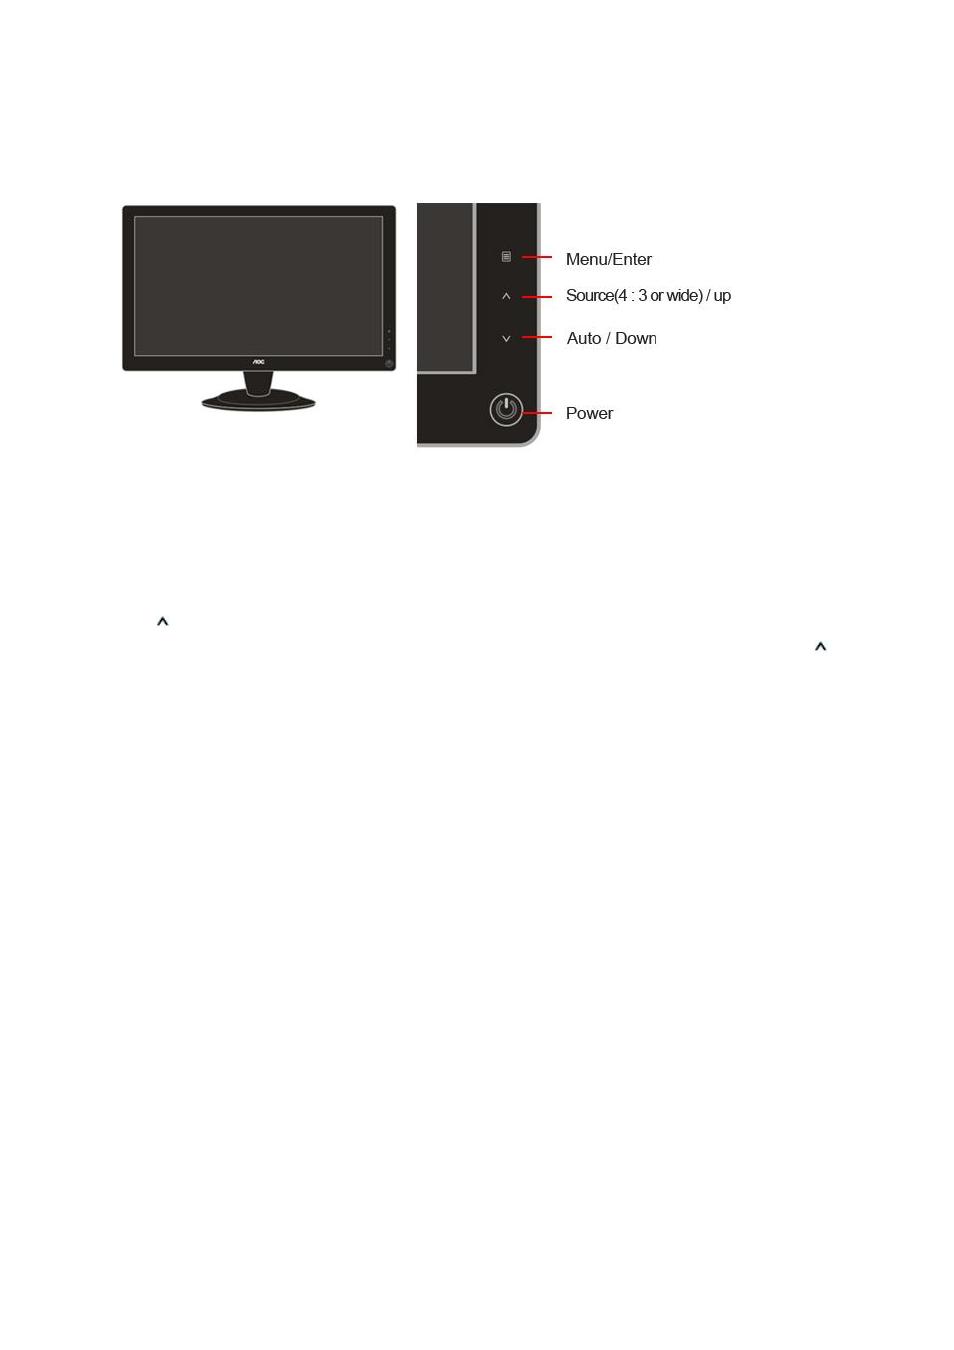 aoc monitor manual 2236vw open source user manual u2022 rh dramatic varieties com AOC Monitor Repair AOC e950Swn Manual